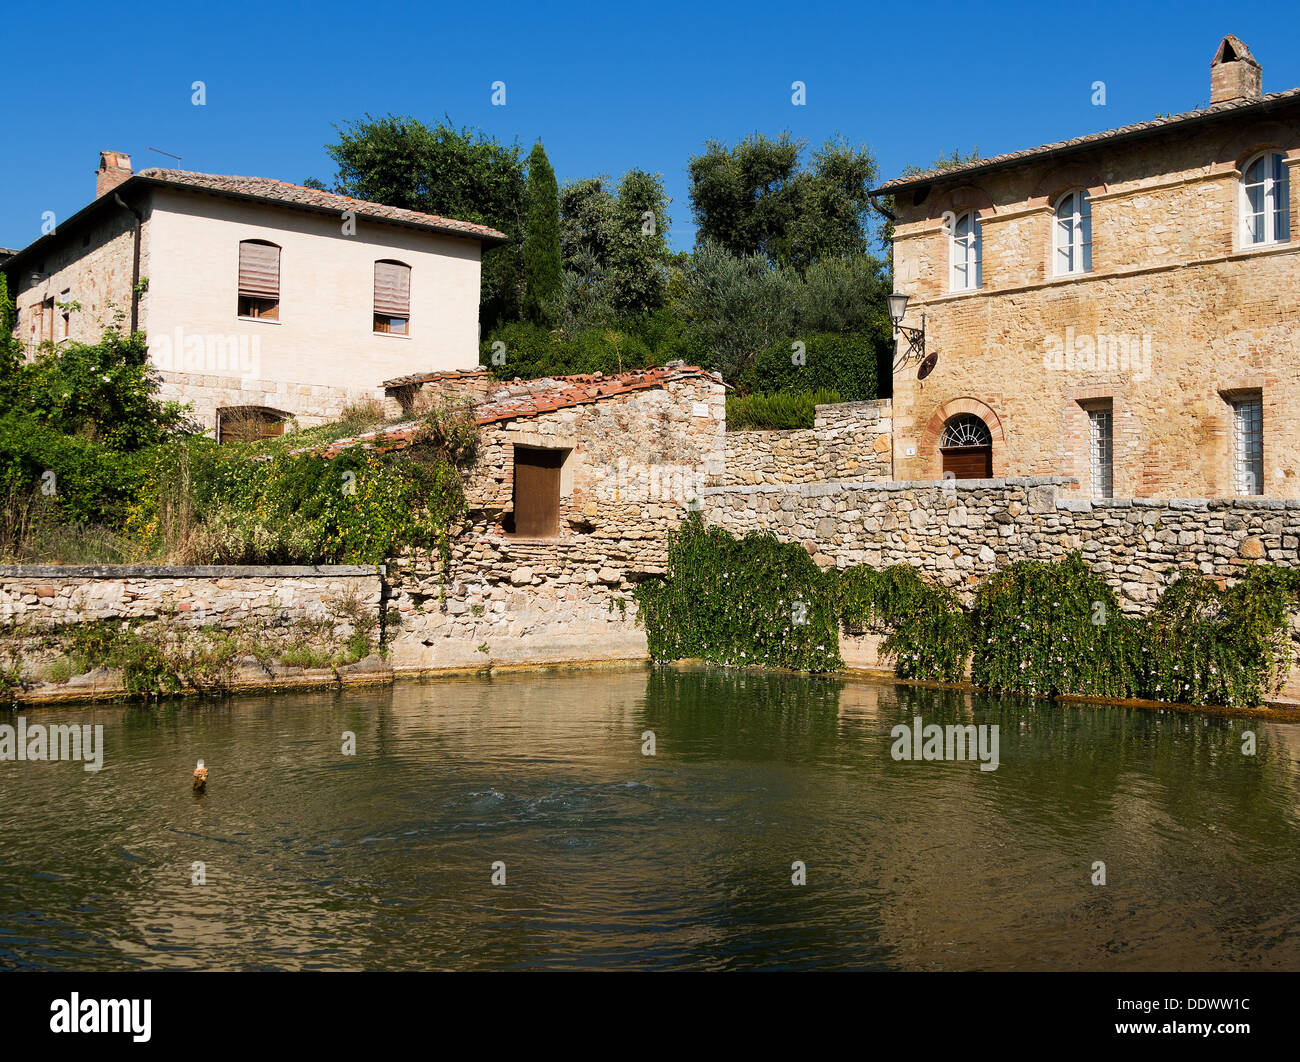 Bagni Vignone - hot water spa, Tuscany, Italy Stock Photo, Royalty ...